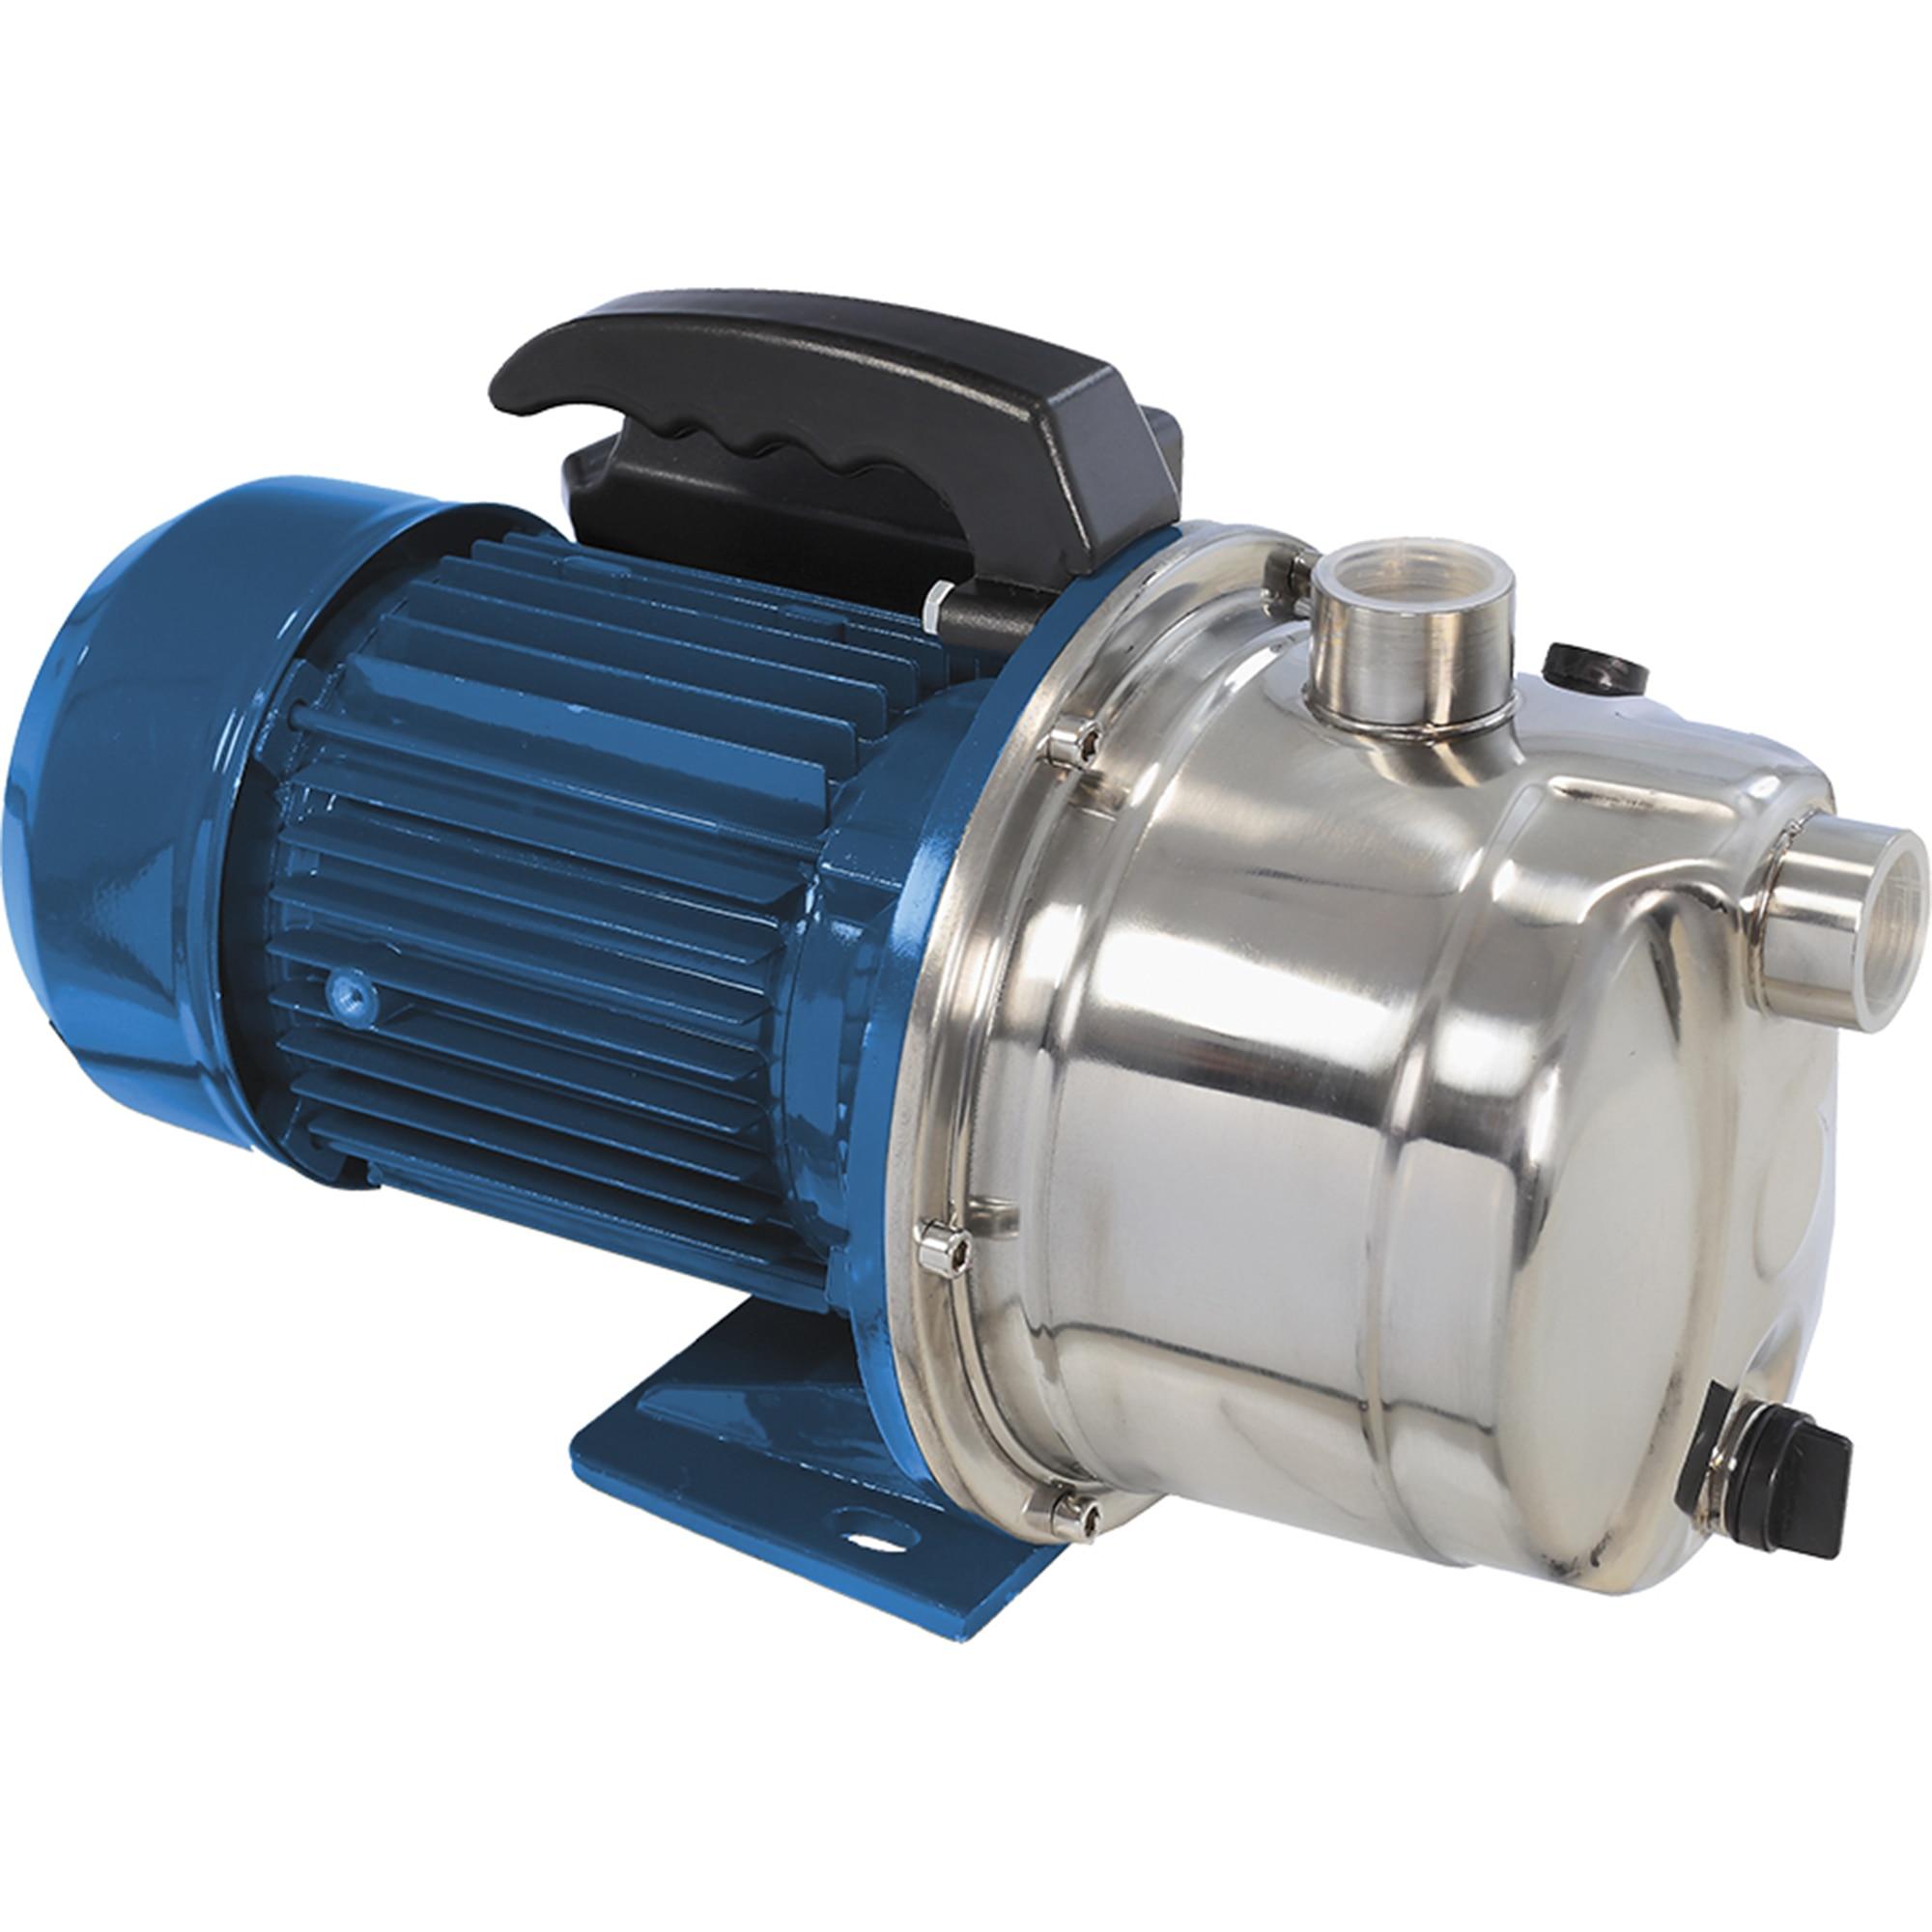 Fotografie Pompa suprafata apa curata Wasserkonig WKX3000, 3000 l/h, 900 W, 4.5 bar